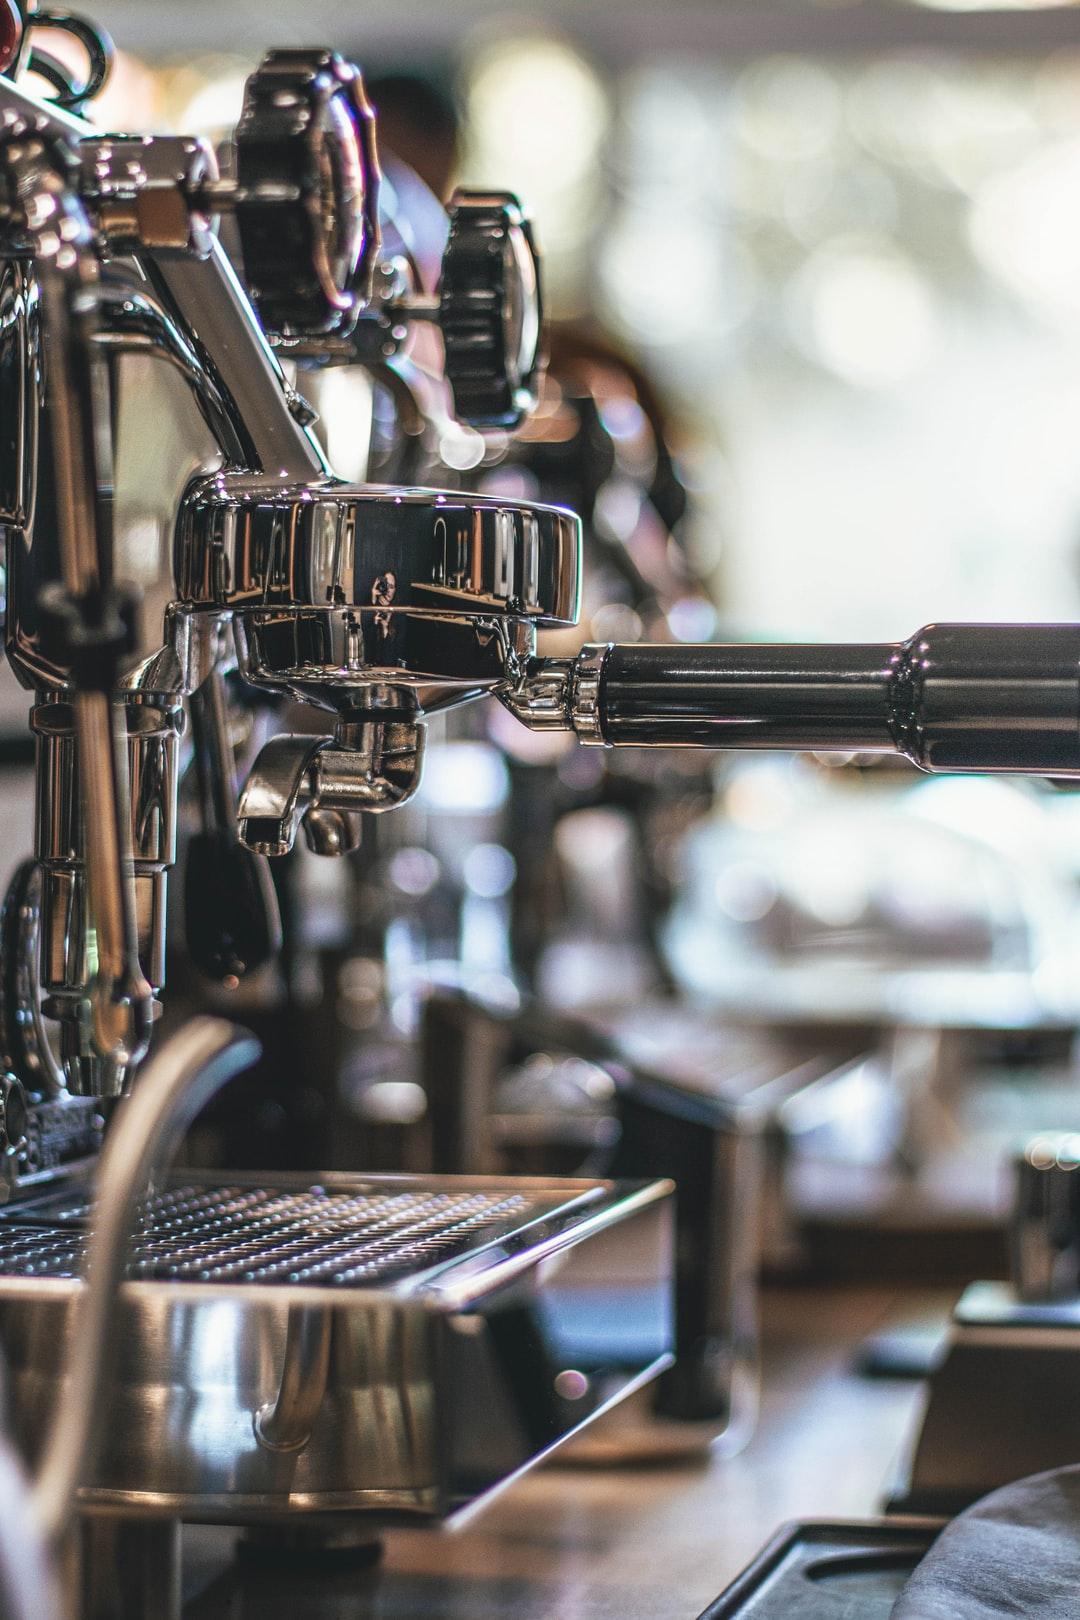 Booinga coffee roaster